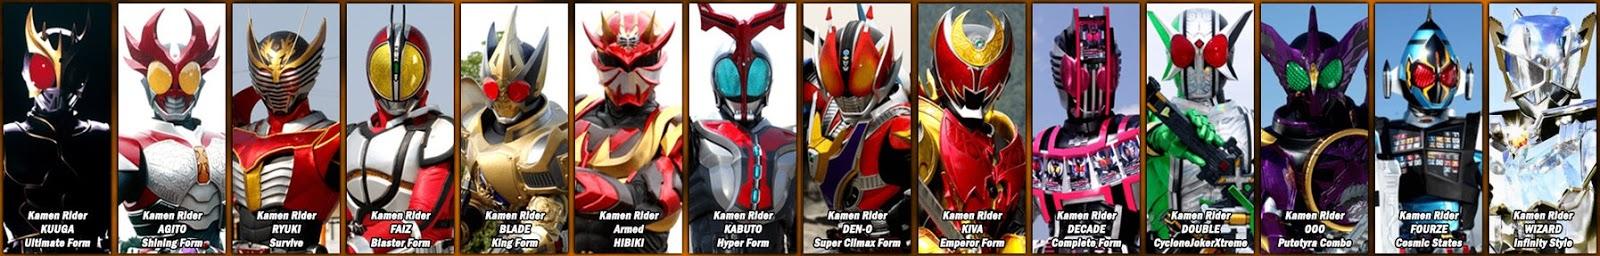 Download Chouseishin Gransazer Episode - Kamen Rider Episode